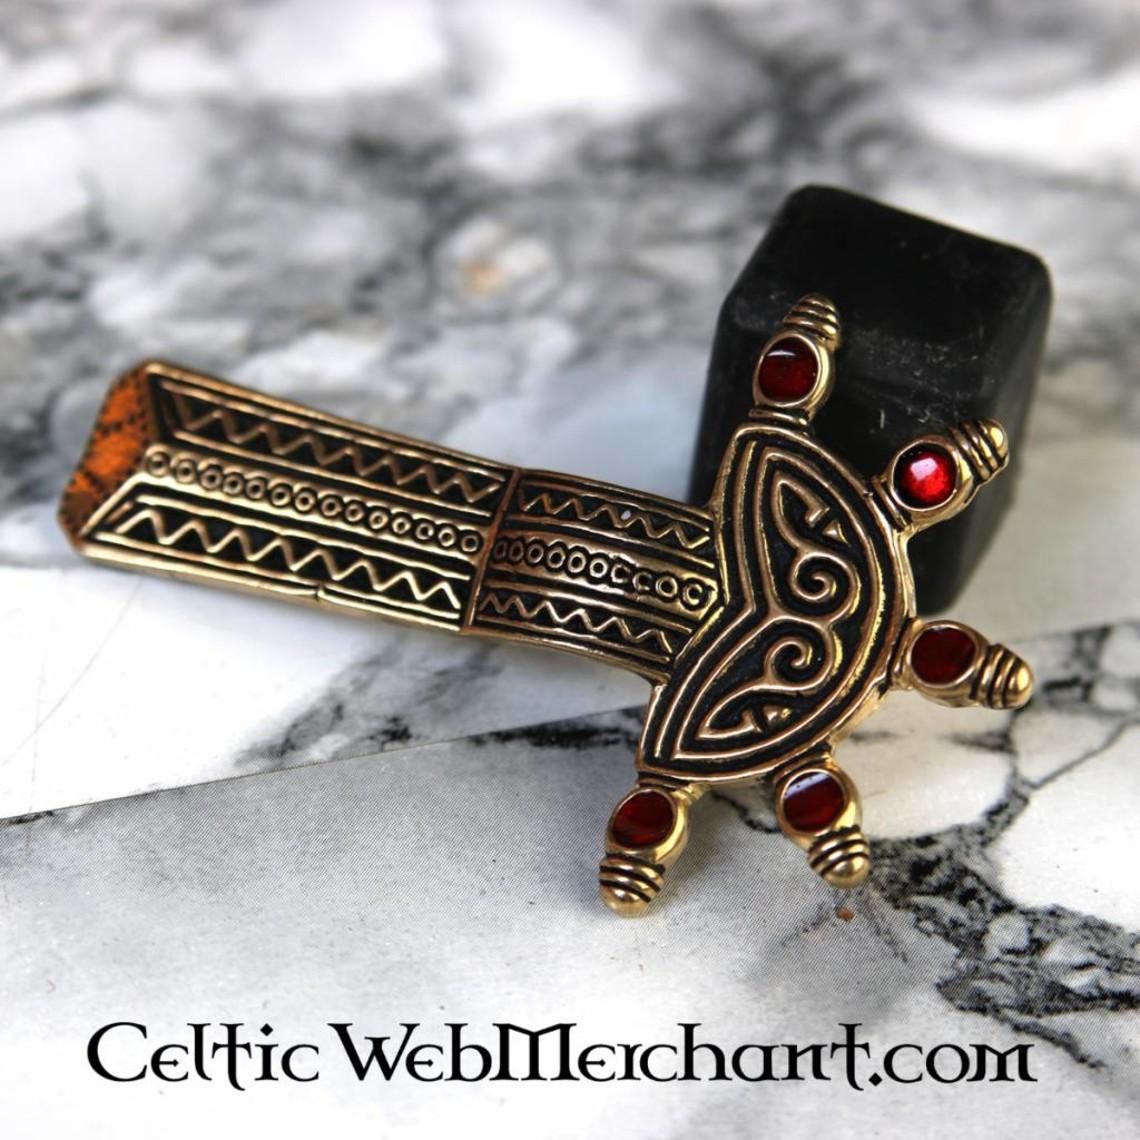 Merovingian bow fibula